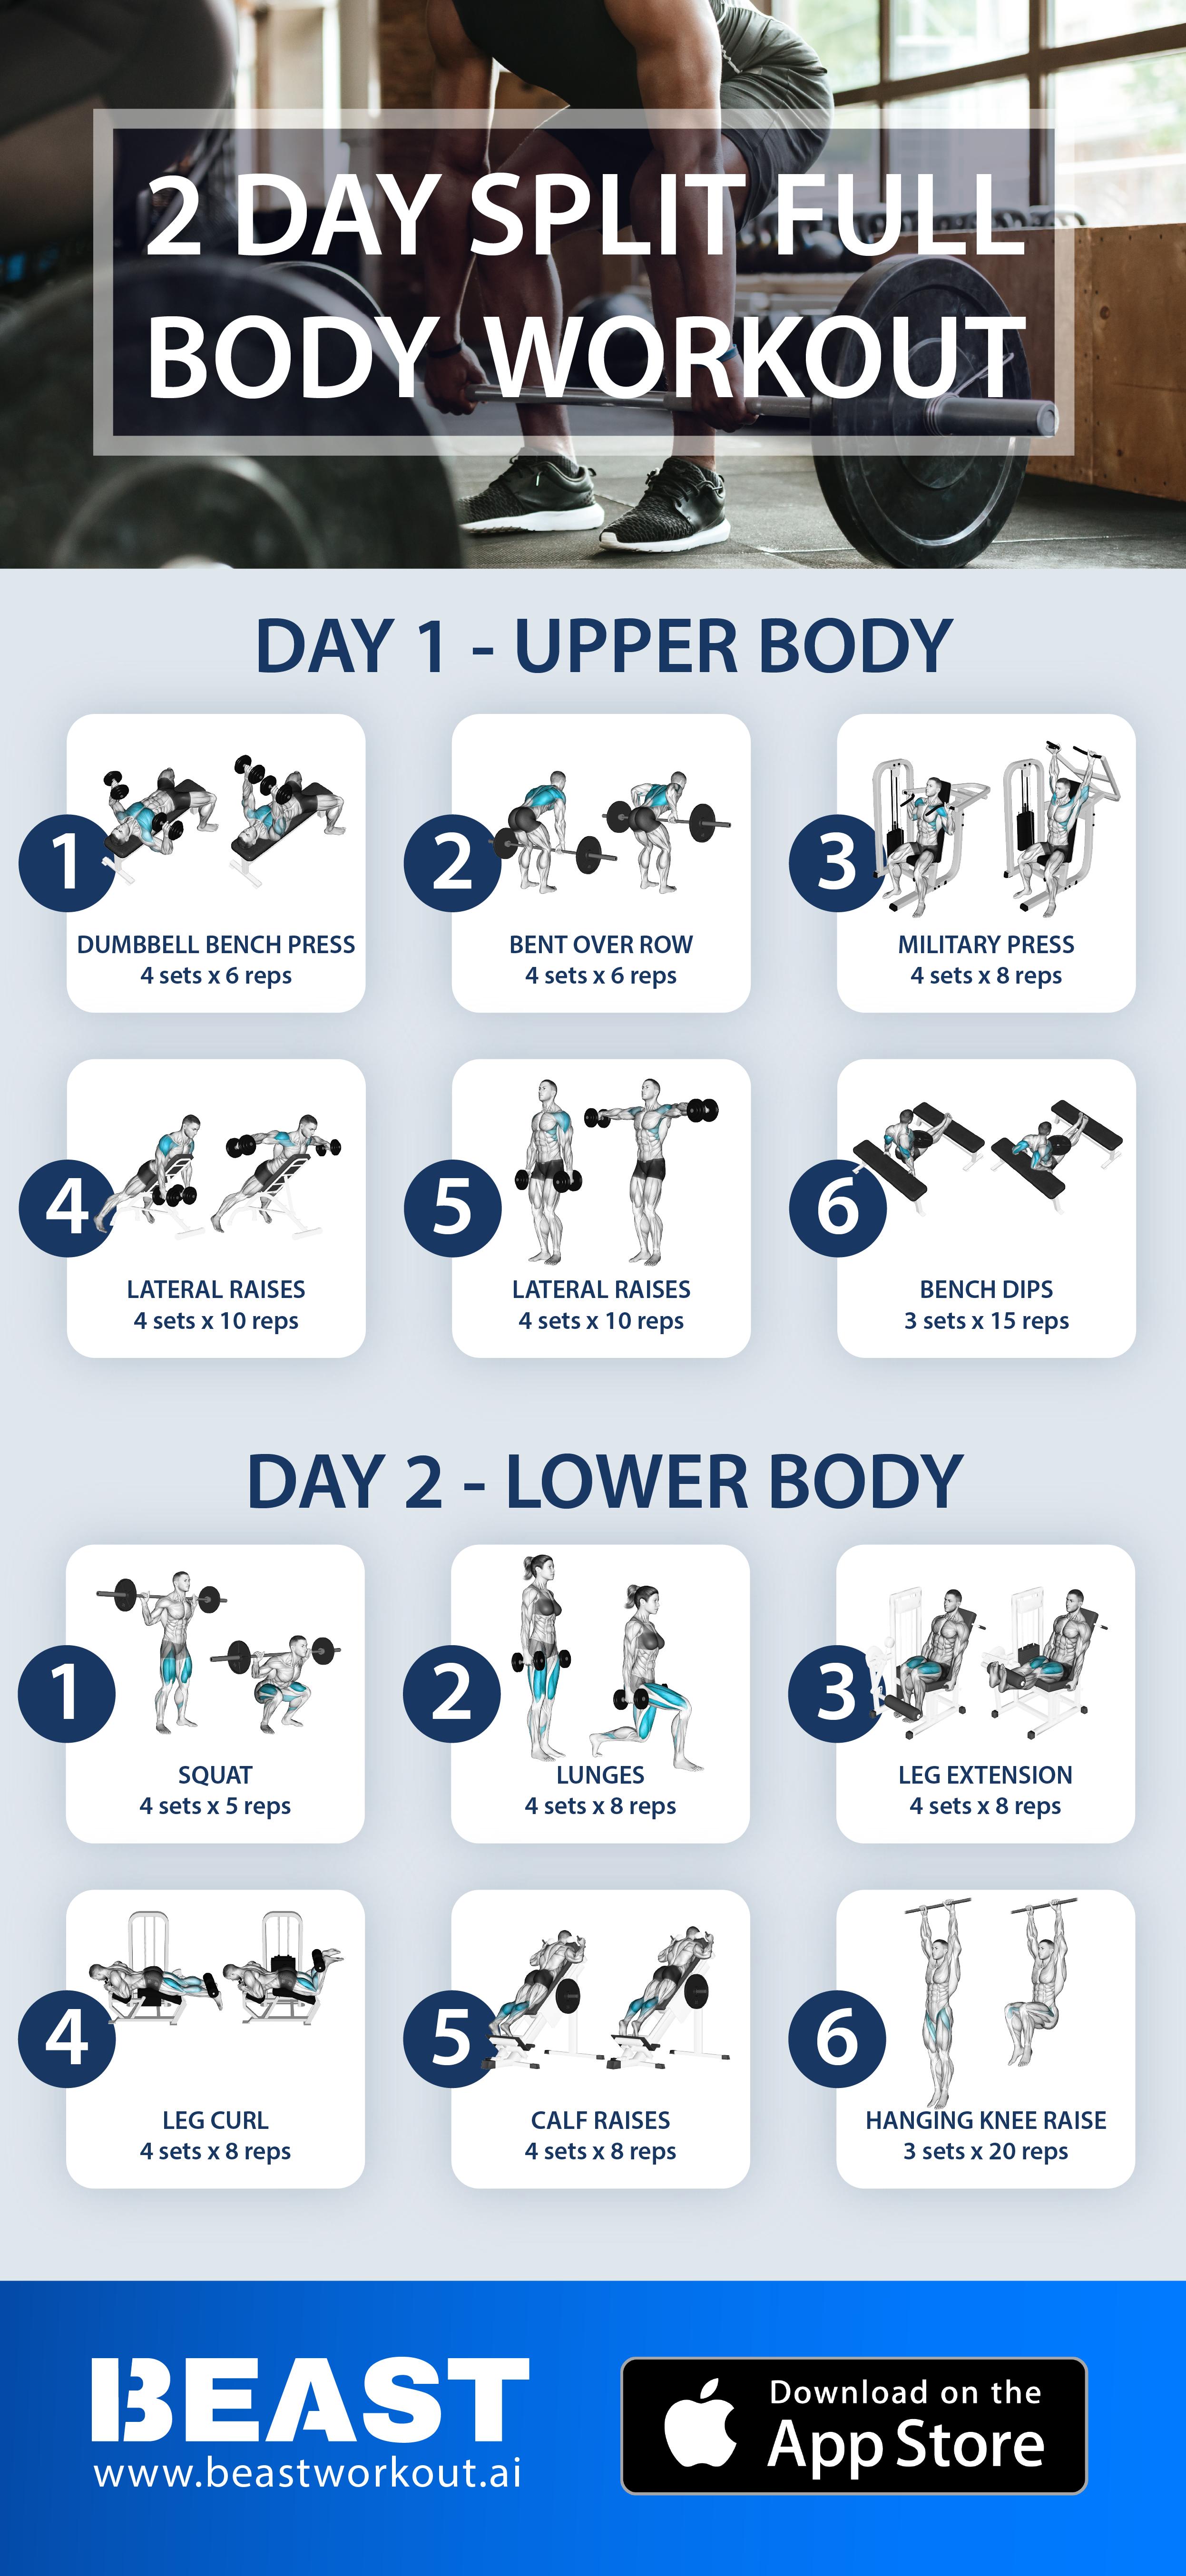 Essential Full Body Workout 2 Day Split In 2020 Full Body Workout Routine Best Full Body Workout Fitness Body